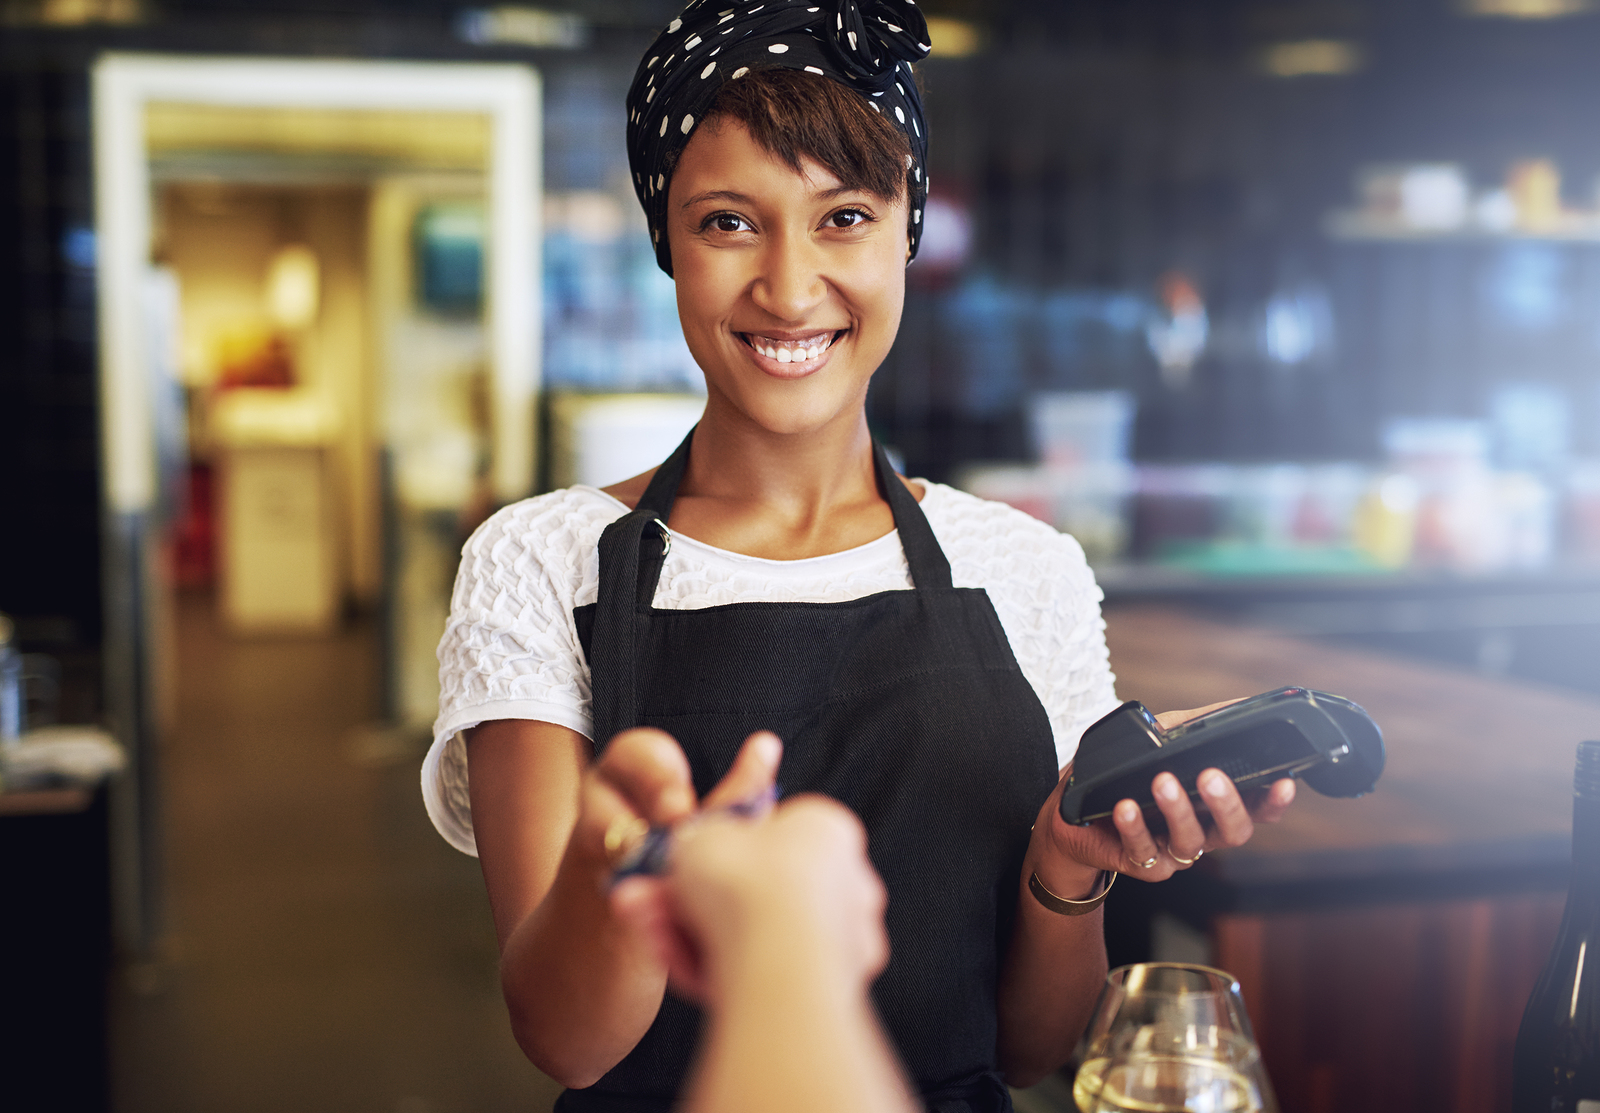 Smiling Waitress Taking A Credit Card